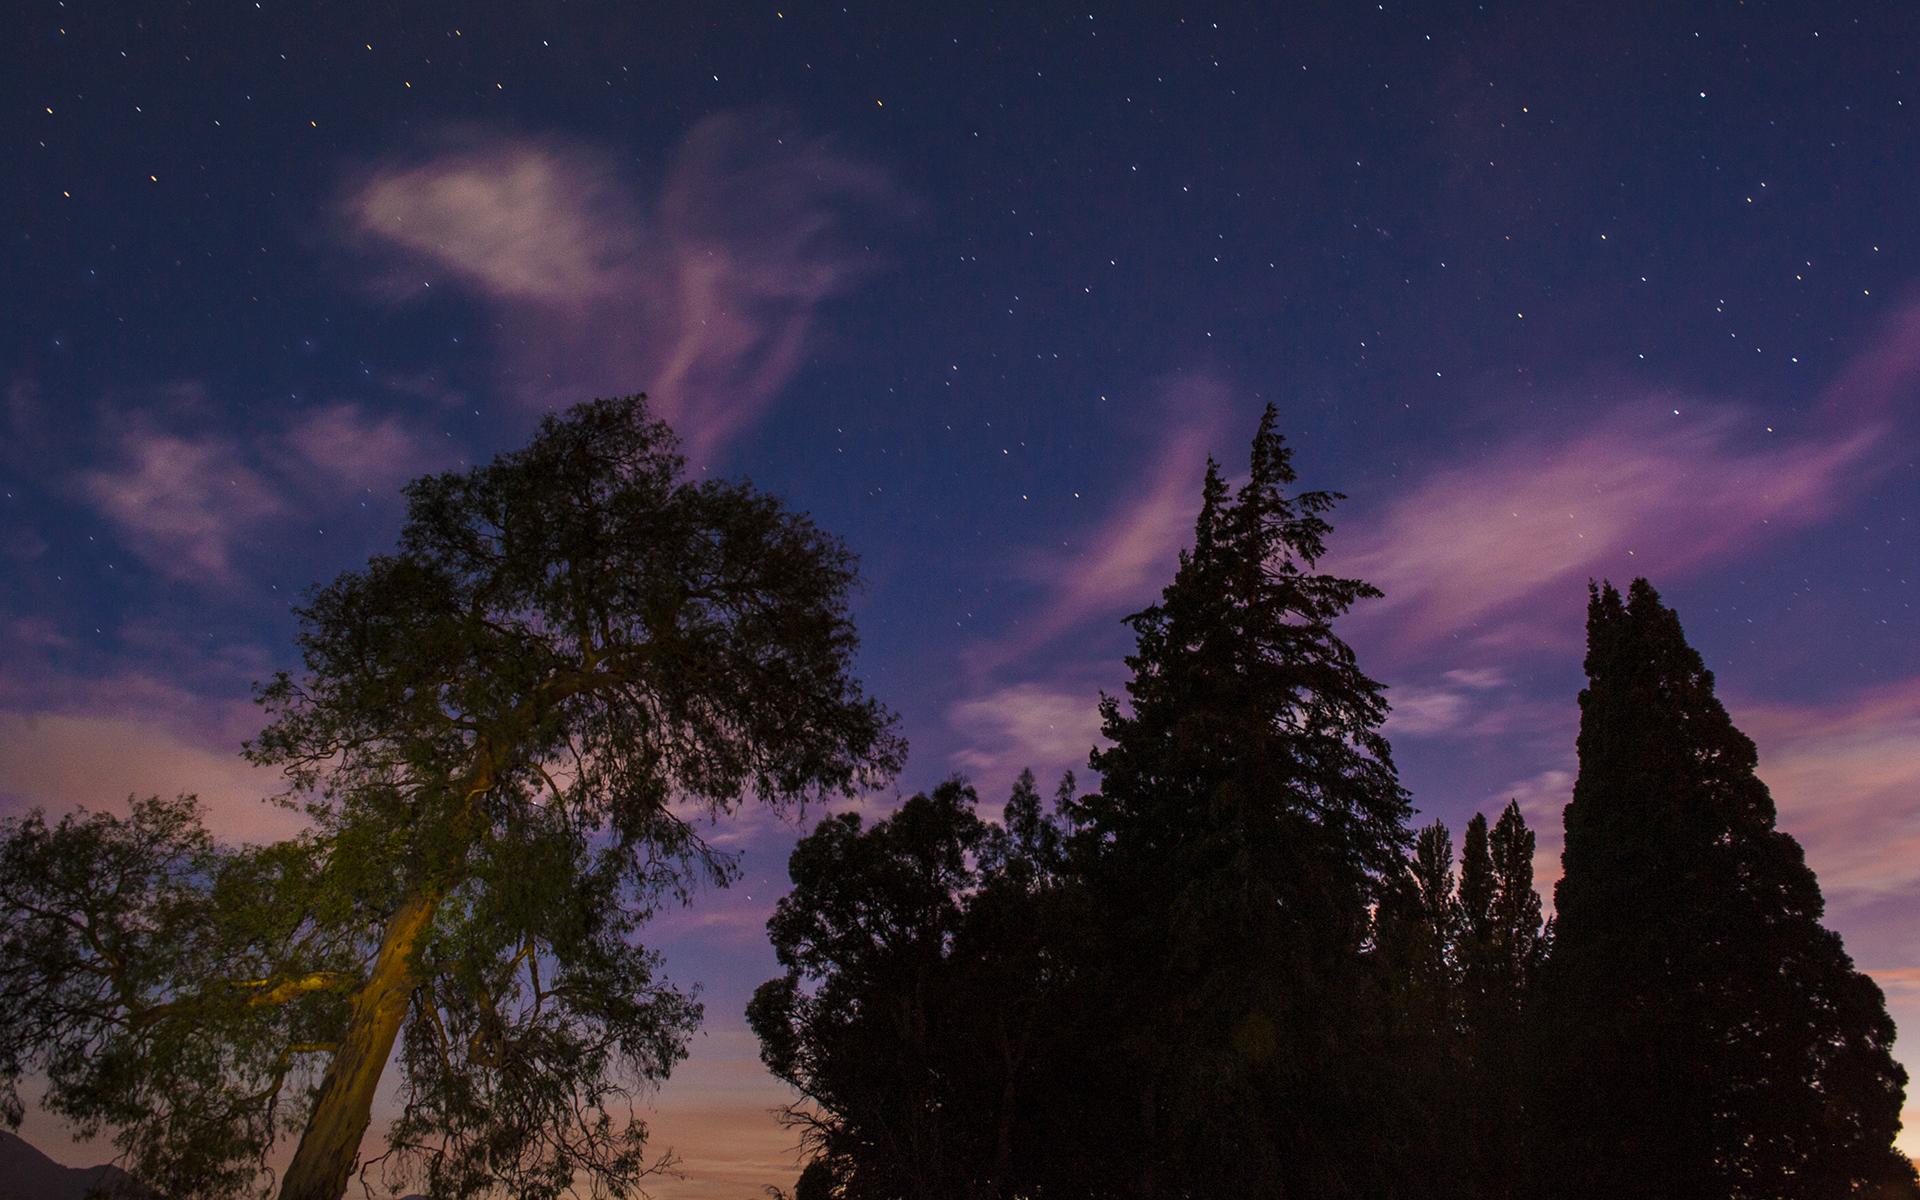 Astro Night Photography Workshop